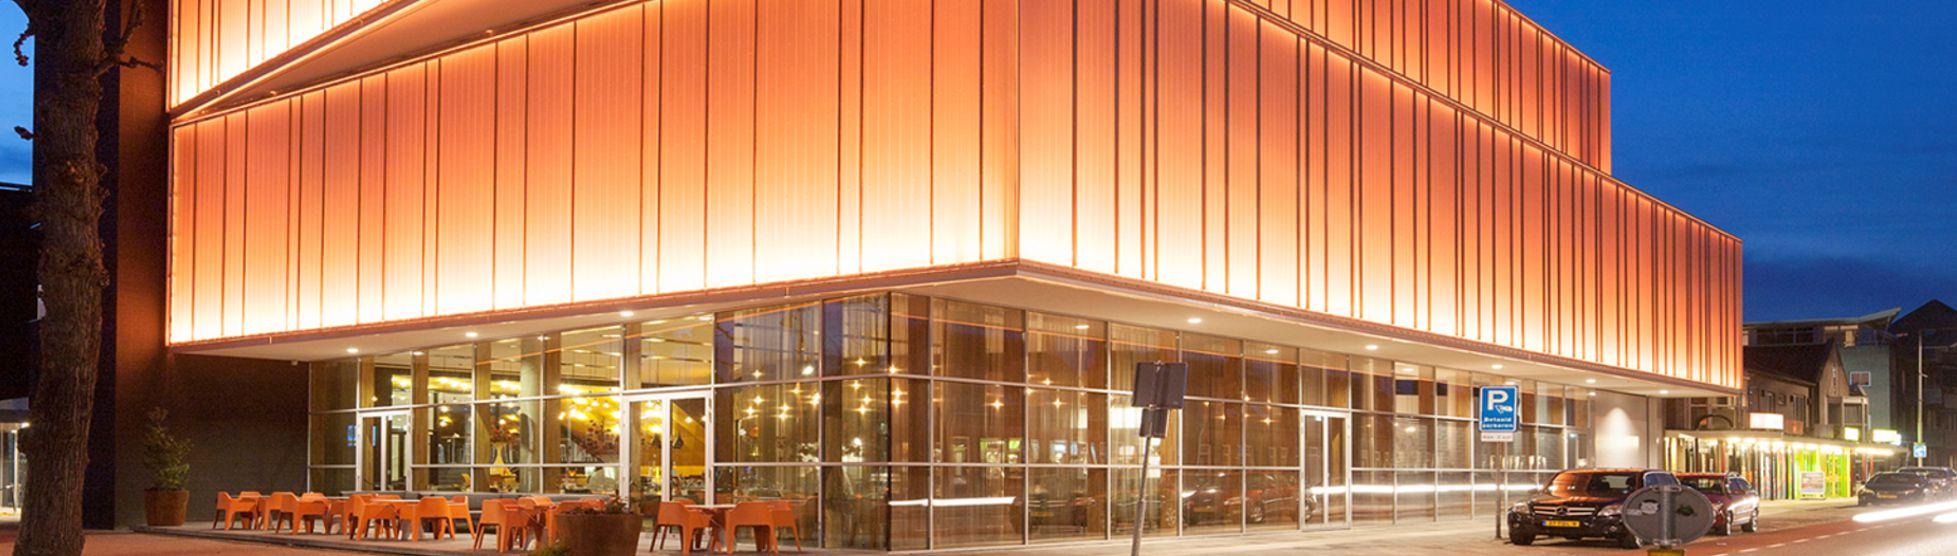 Theater Markant, Uden